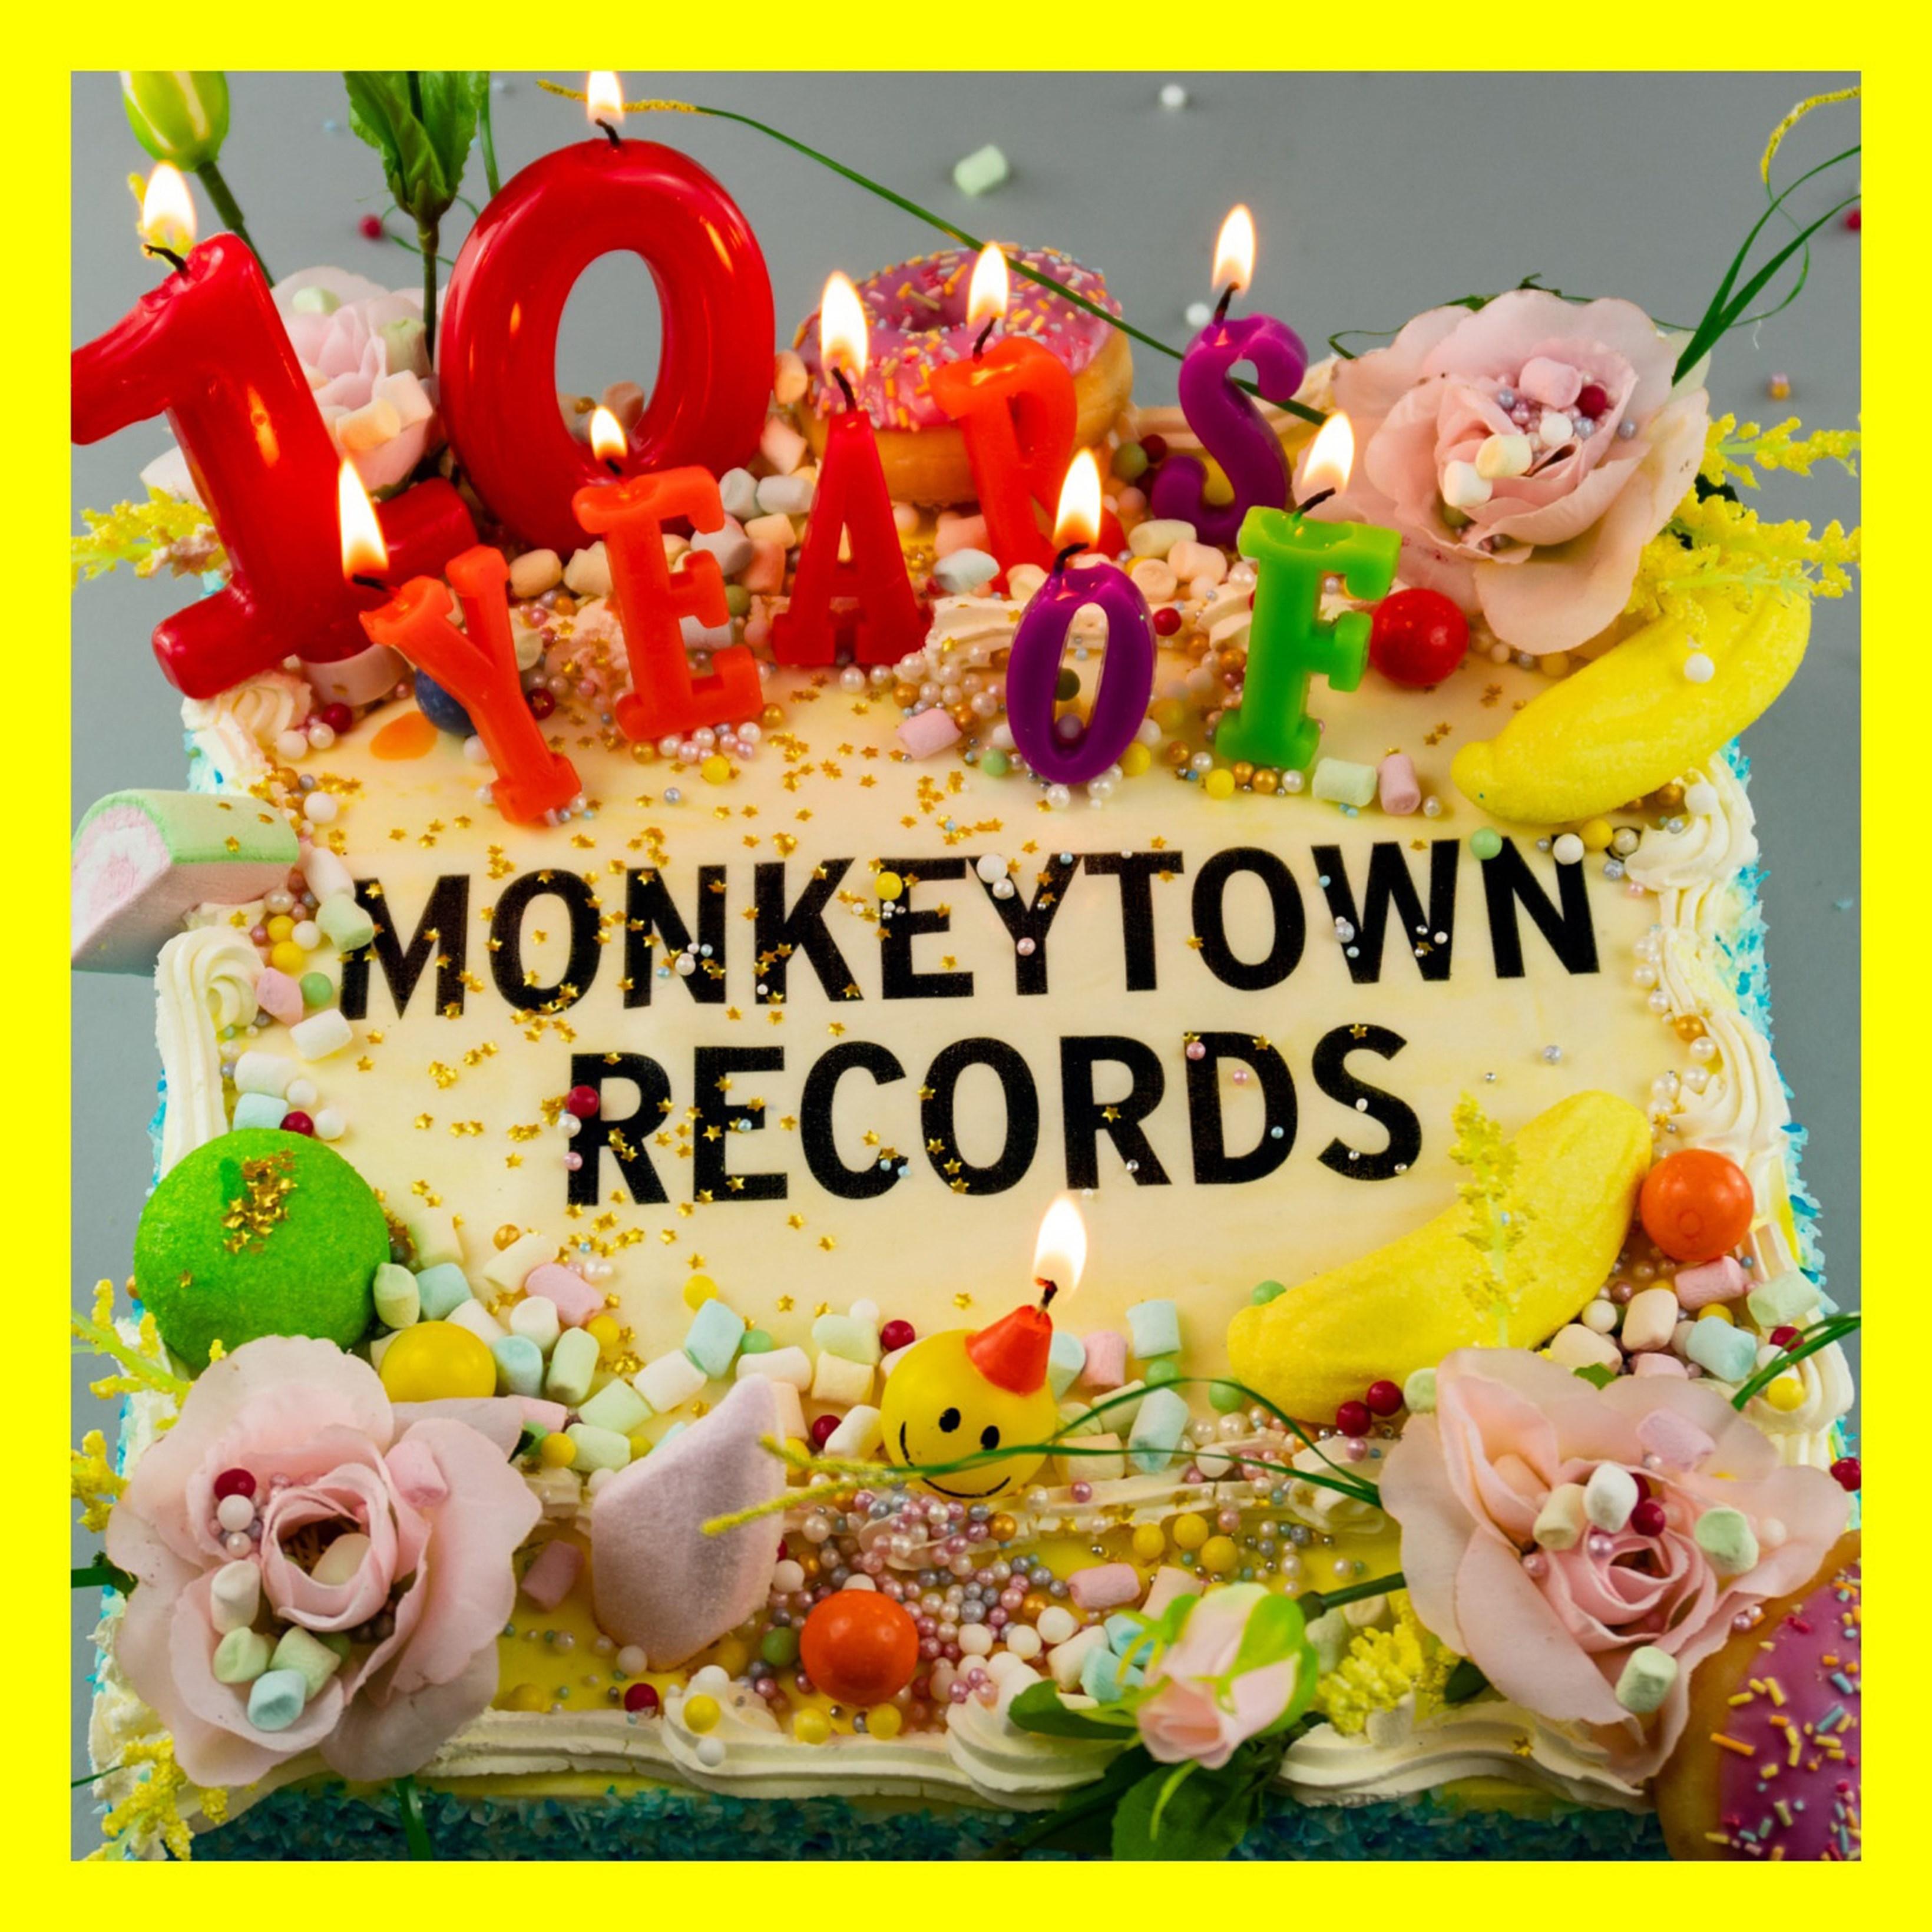 10 Years of Monkeytown - 1